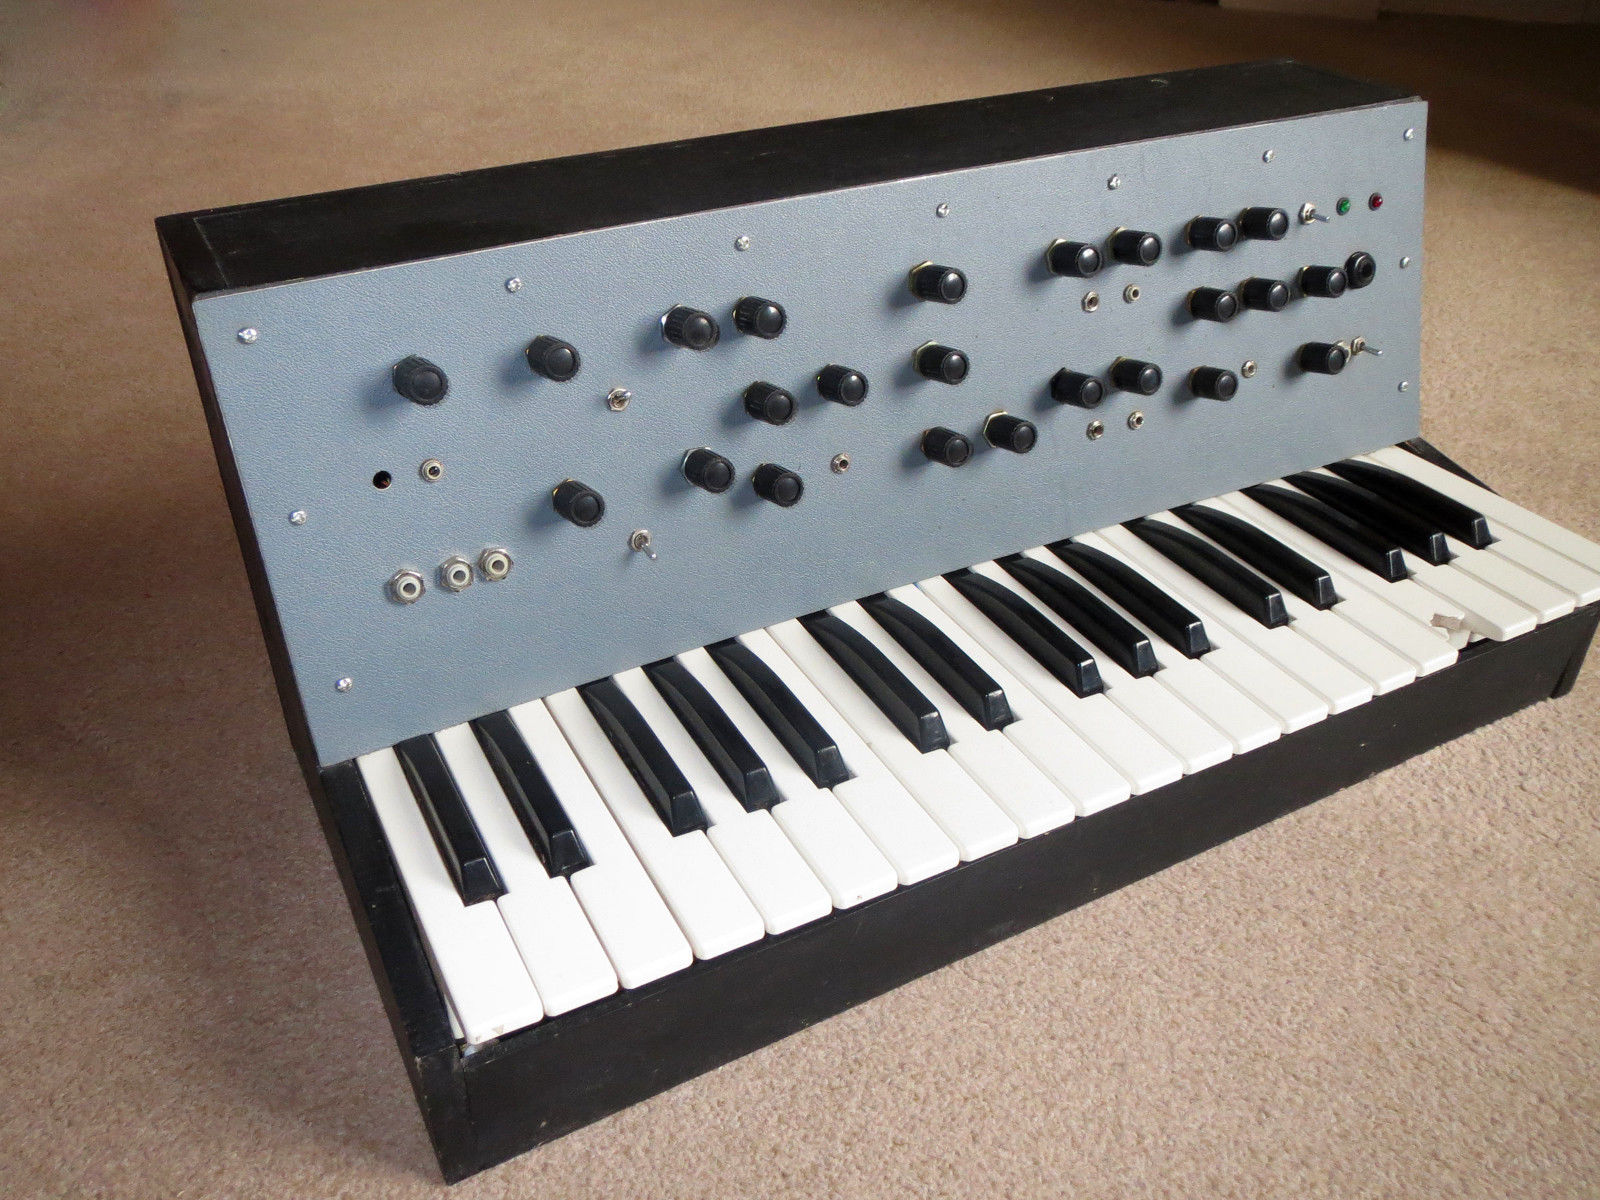 MATRIXSYNTH: Rare R A  Penfold DIY Analogue Synthesizer